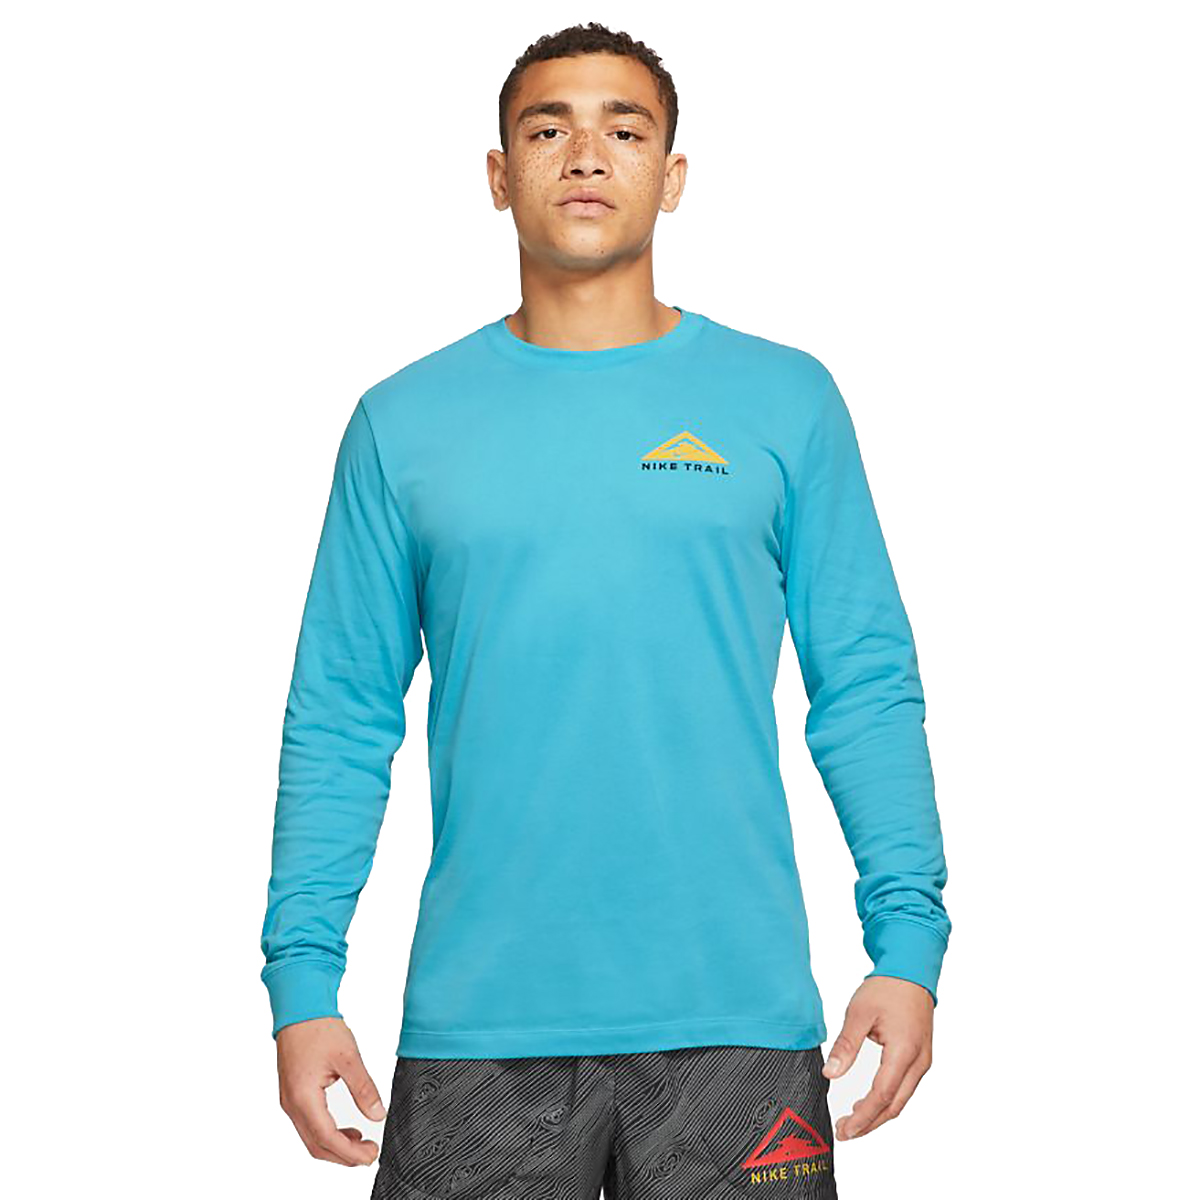 Men's Nike Dri-FIT Long-Sleeve Trail Running T-Shirt - Color: Chlorine Blue - Size: XS, Chlorine Blue, large, image 1